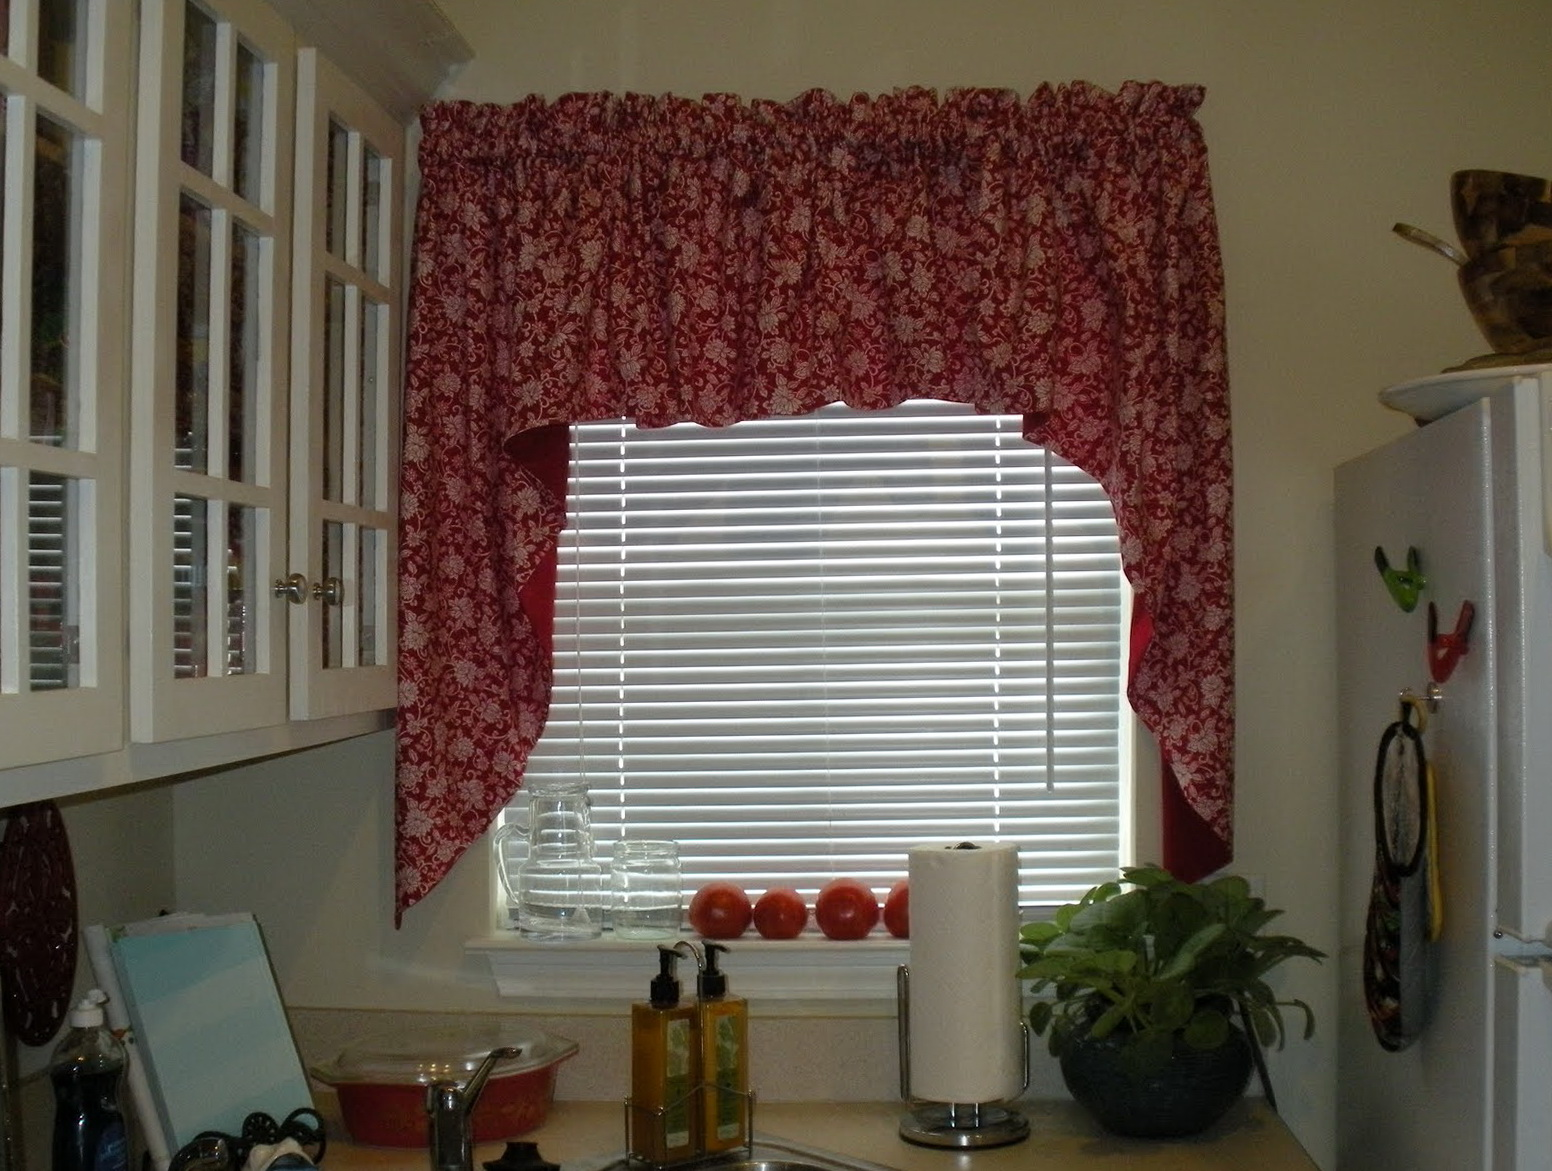 Curtain Ideas For Small Kitchen Windows Home Design Ideas